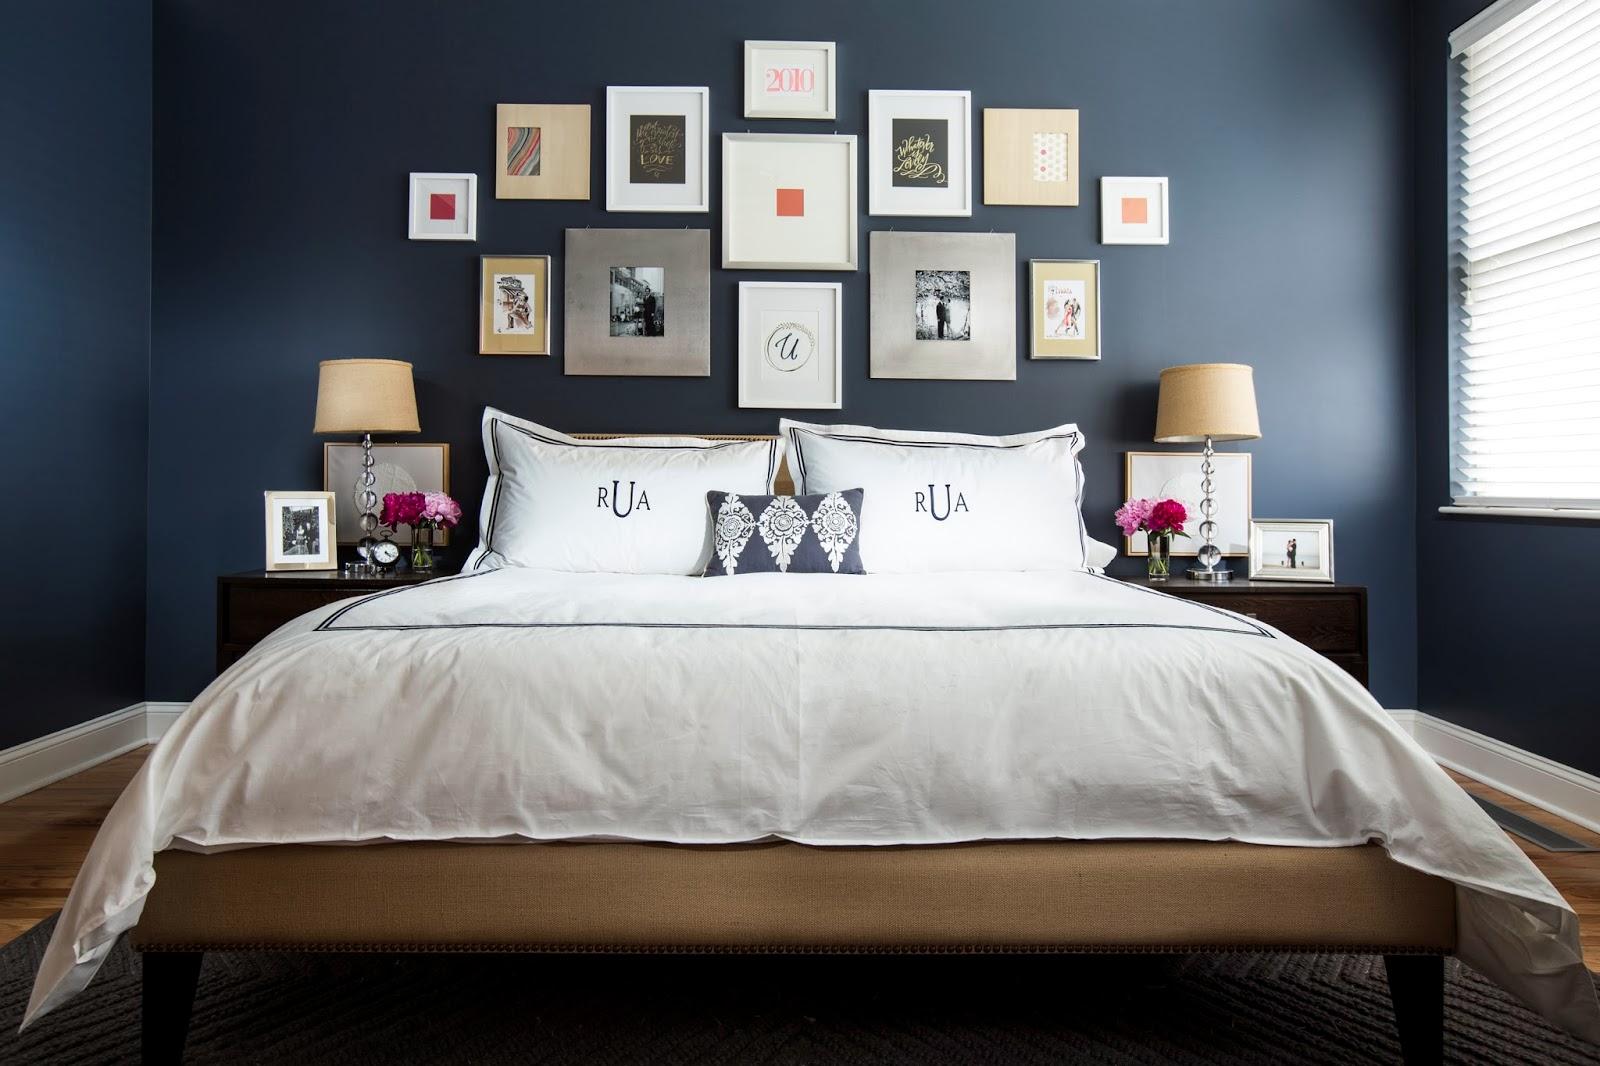 Bedroom Decorating Ideas Navy Blue Bedroom Decorating